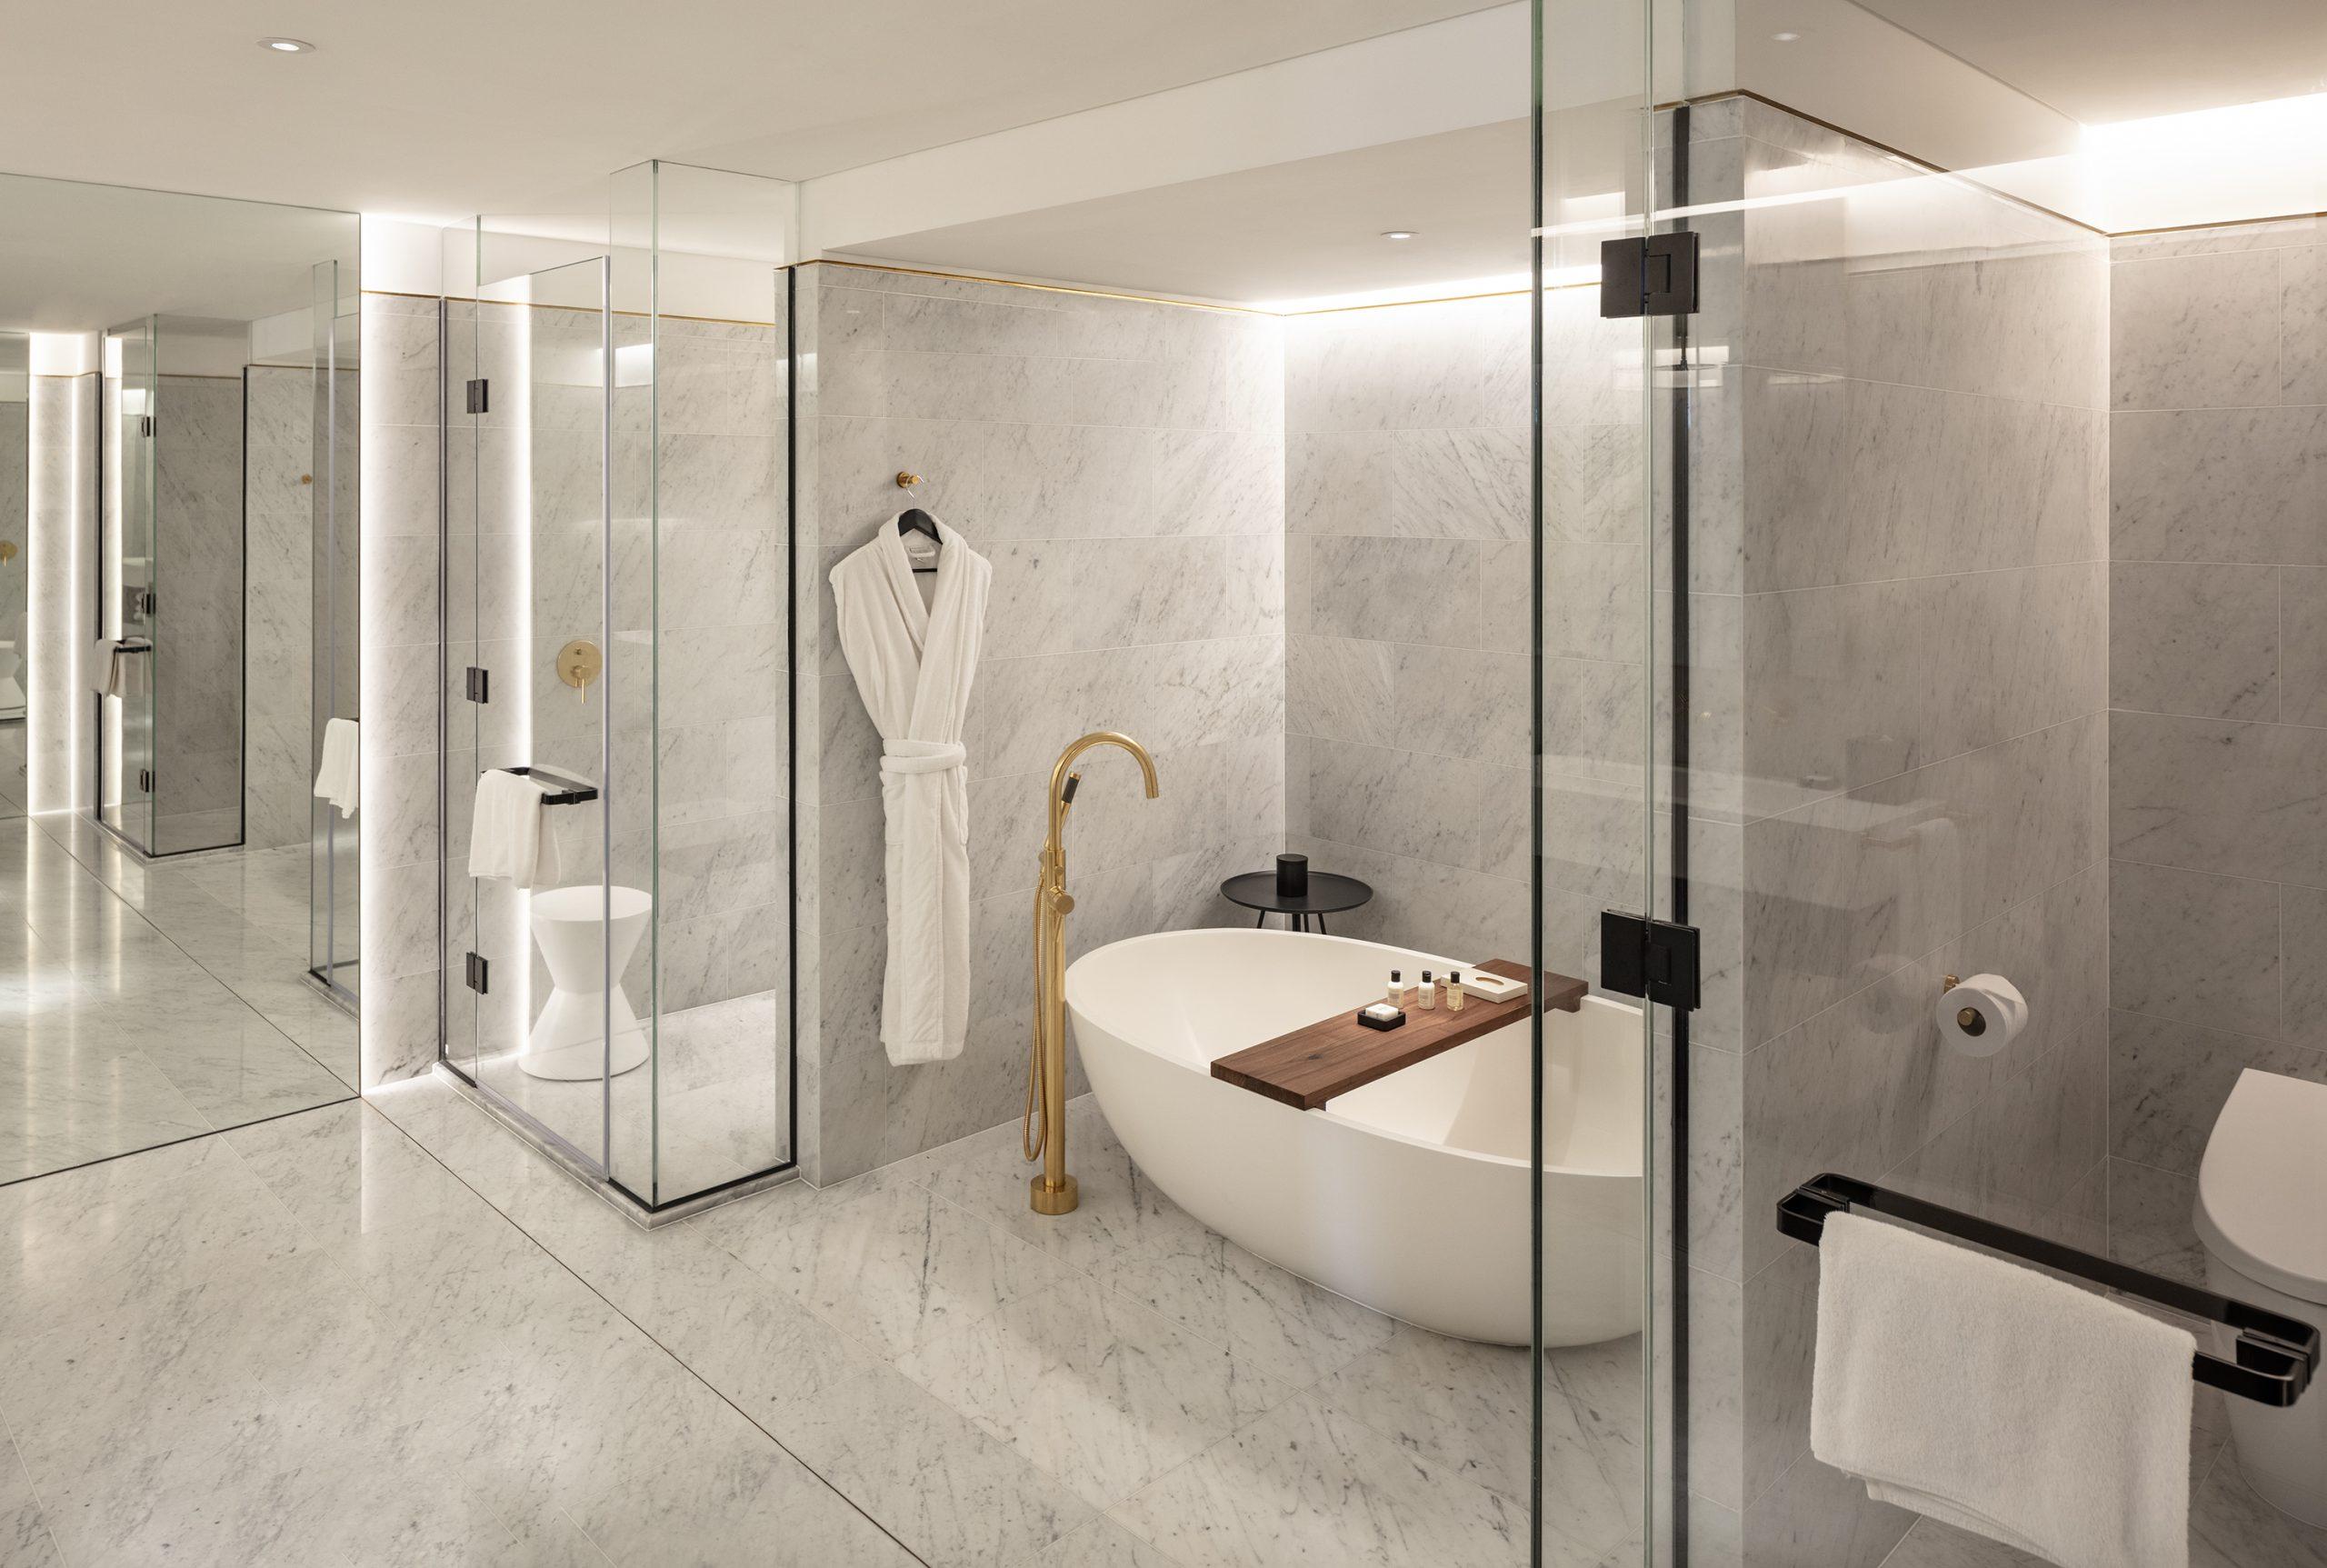 park hyatt executive suite bathroom